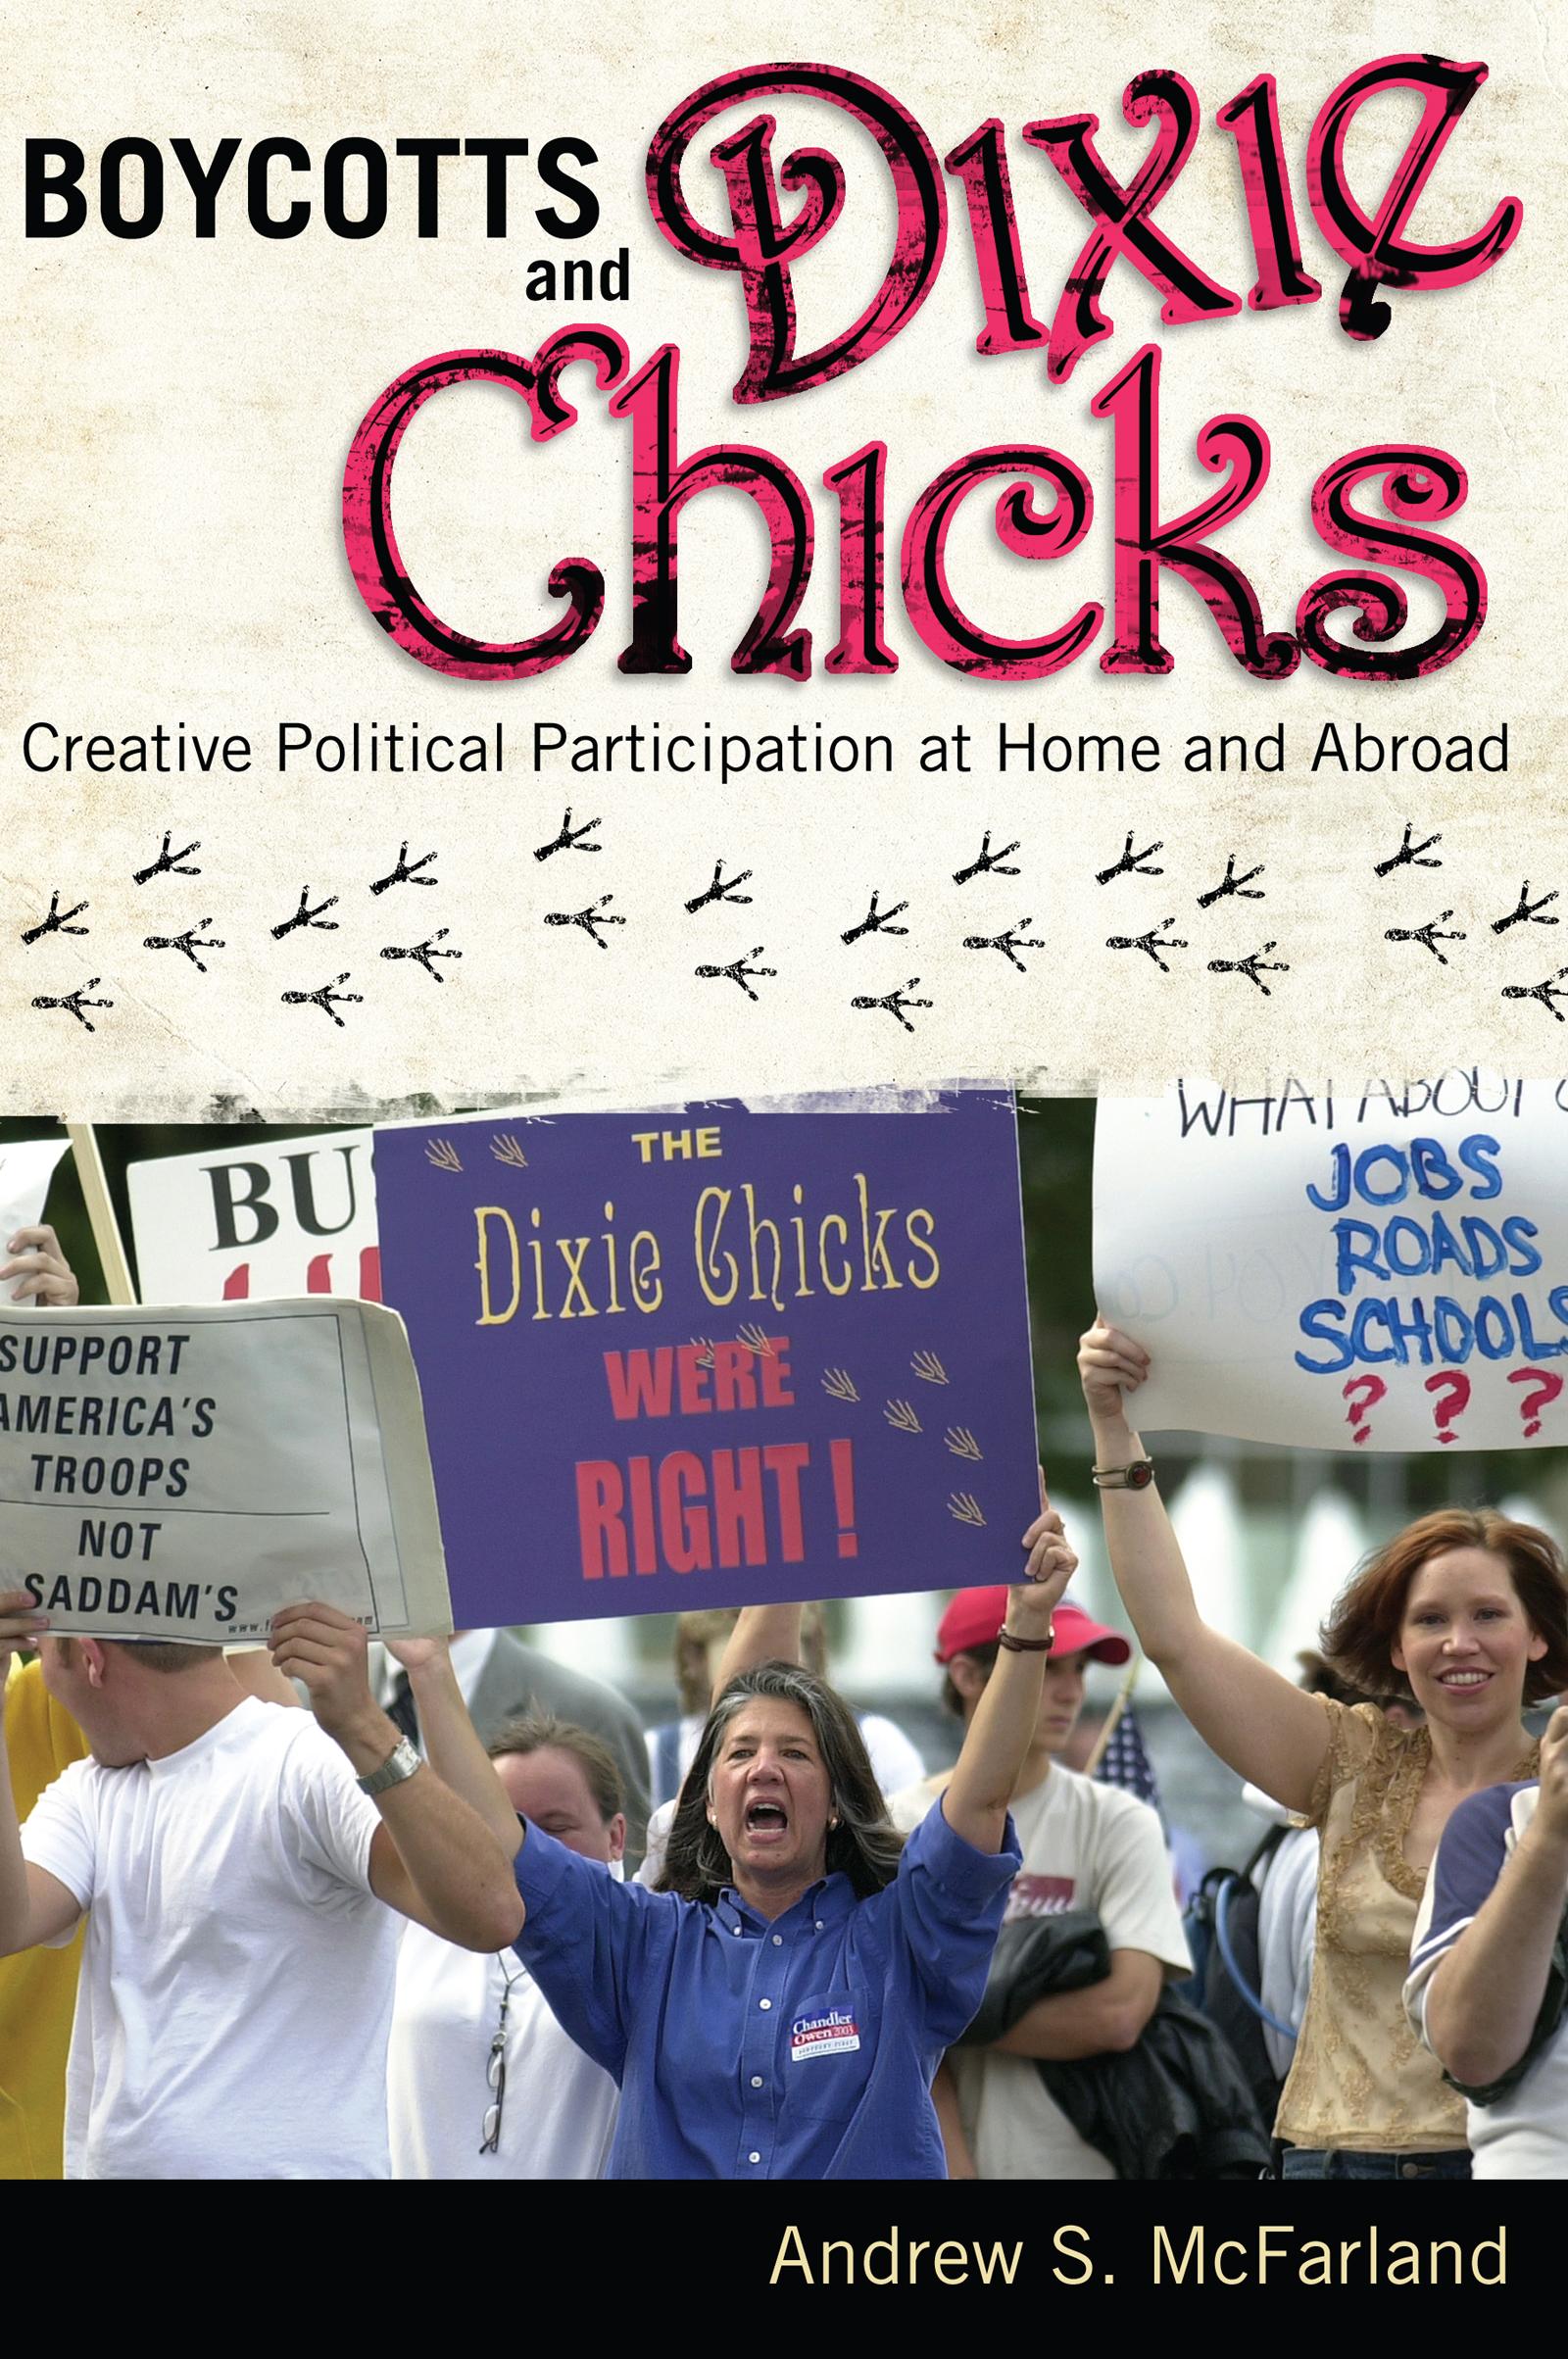 Boycotts and Dixie Chicks